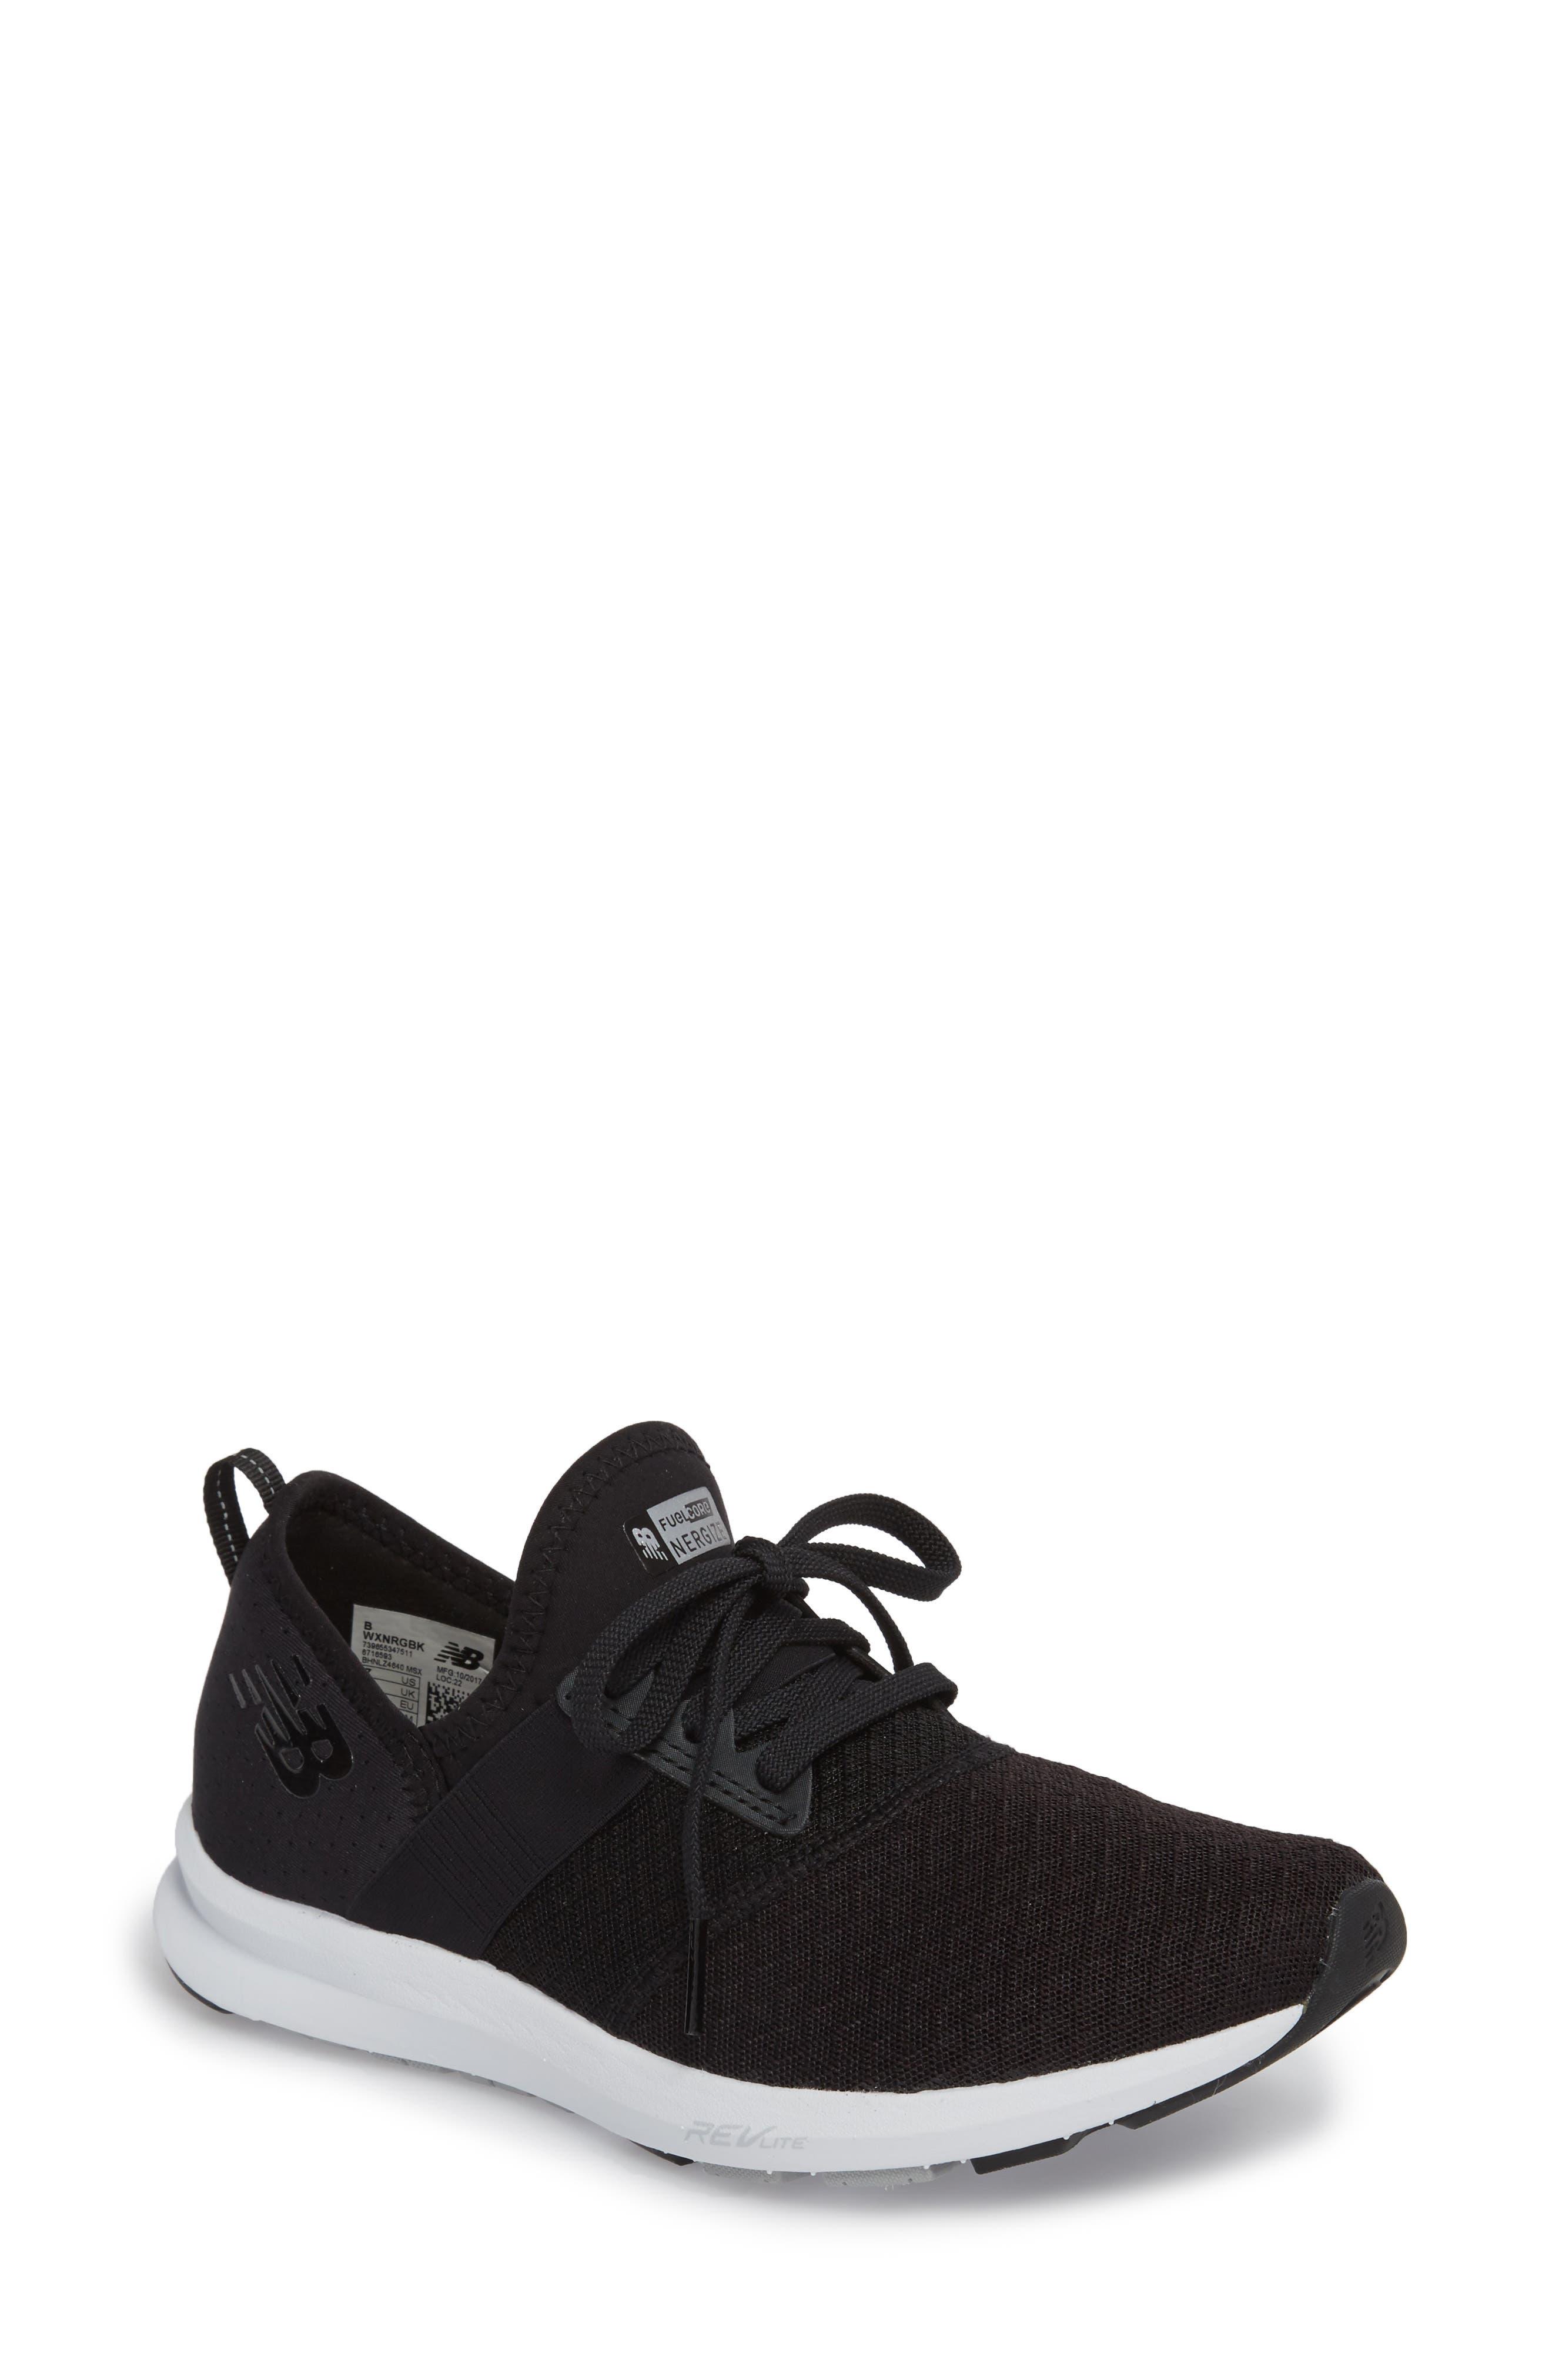 FuelCore NERGIZE Sneaker,                             Main thumbnail 1, color,                             BLACK